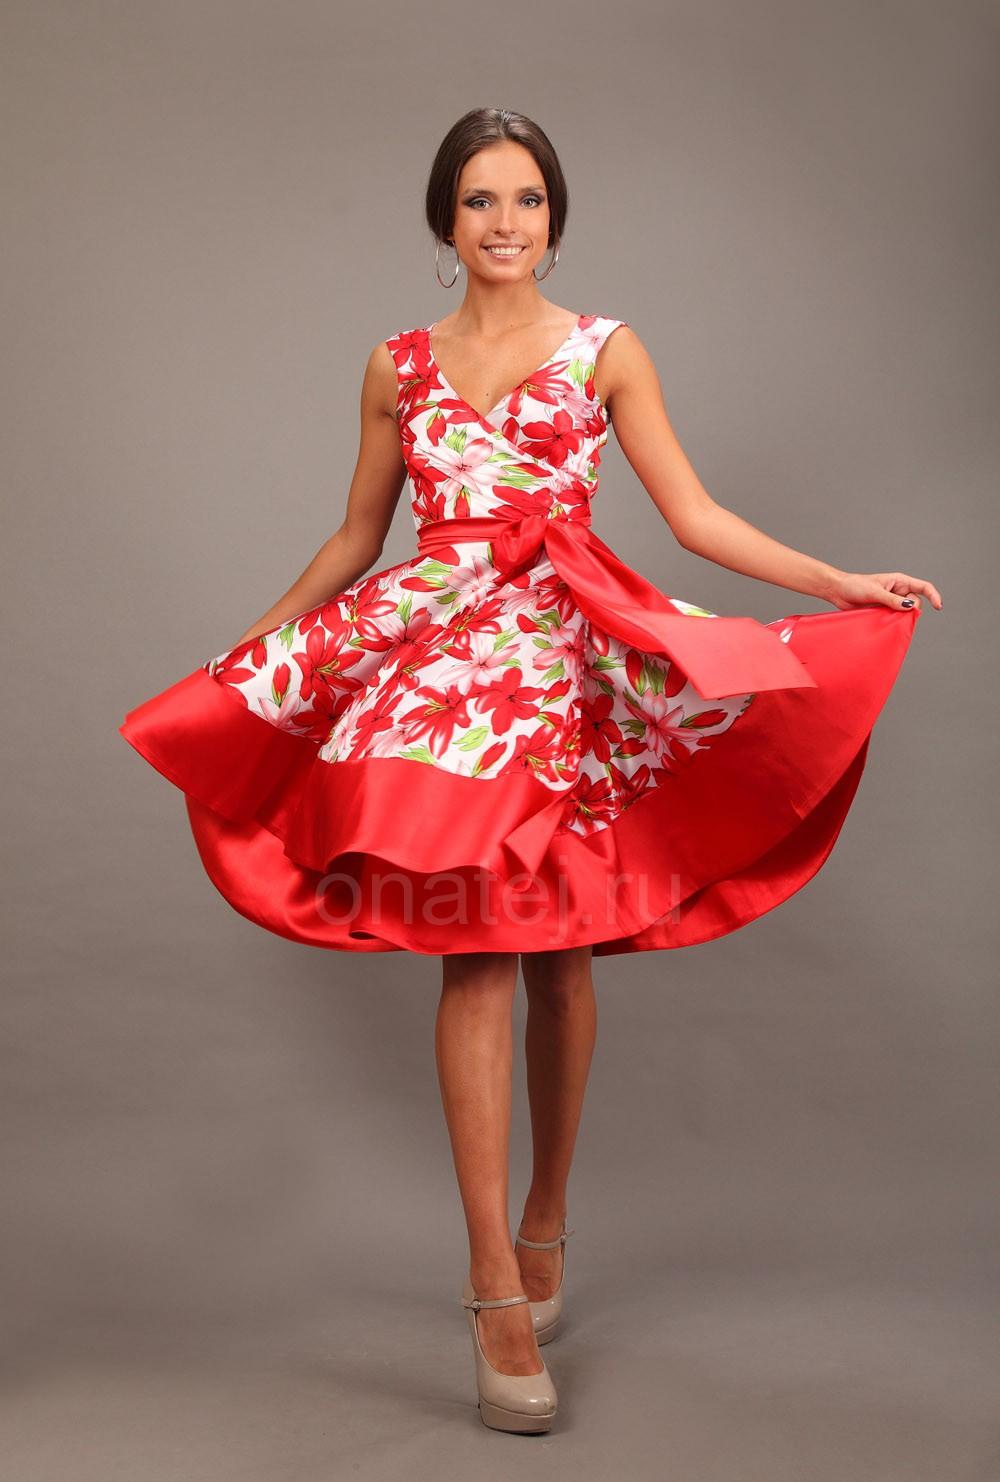 2eadd9a9d27 Пристрой платье O NATEeJ раз.48 - длинный желтый сарафан пермь 46 размер